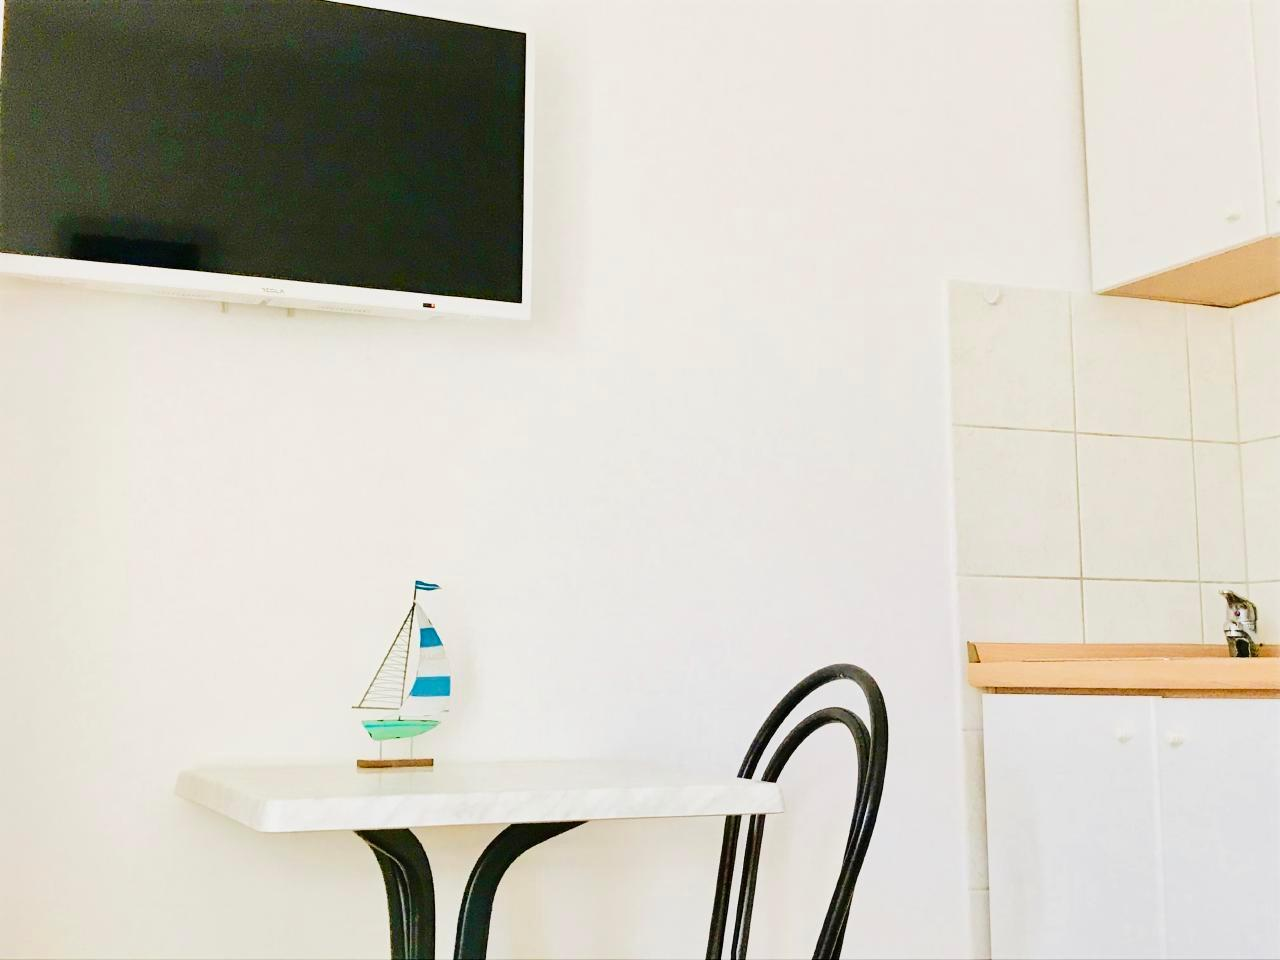 Ferienwohnung Apartmenthaus Ruza 3 - Studio (98391), Kaštel Štafilić, , Dalmatien, Kroatien, Bild 8